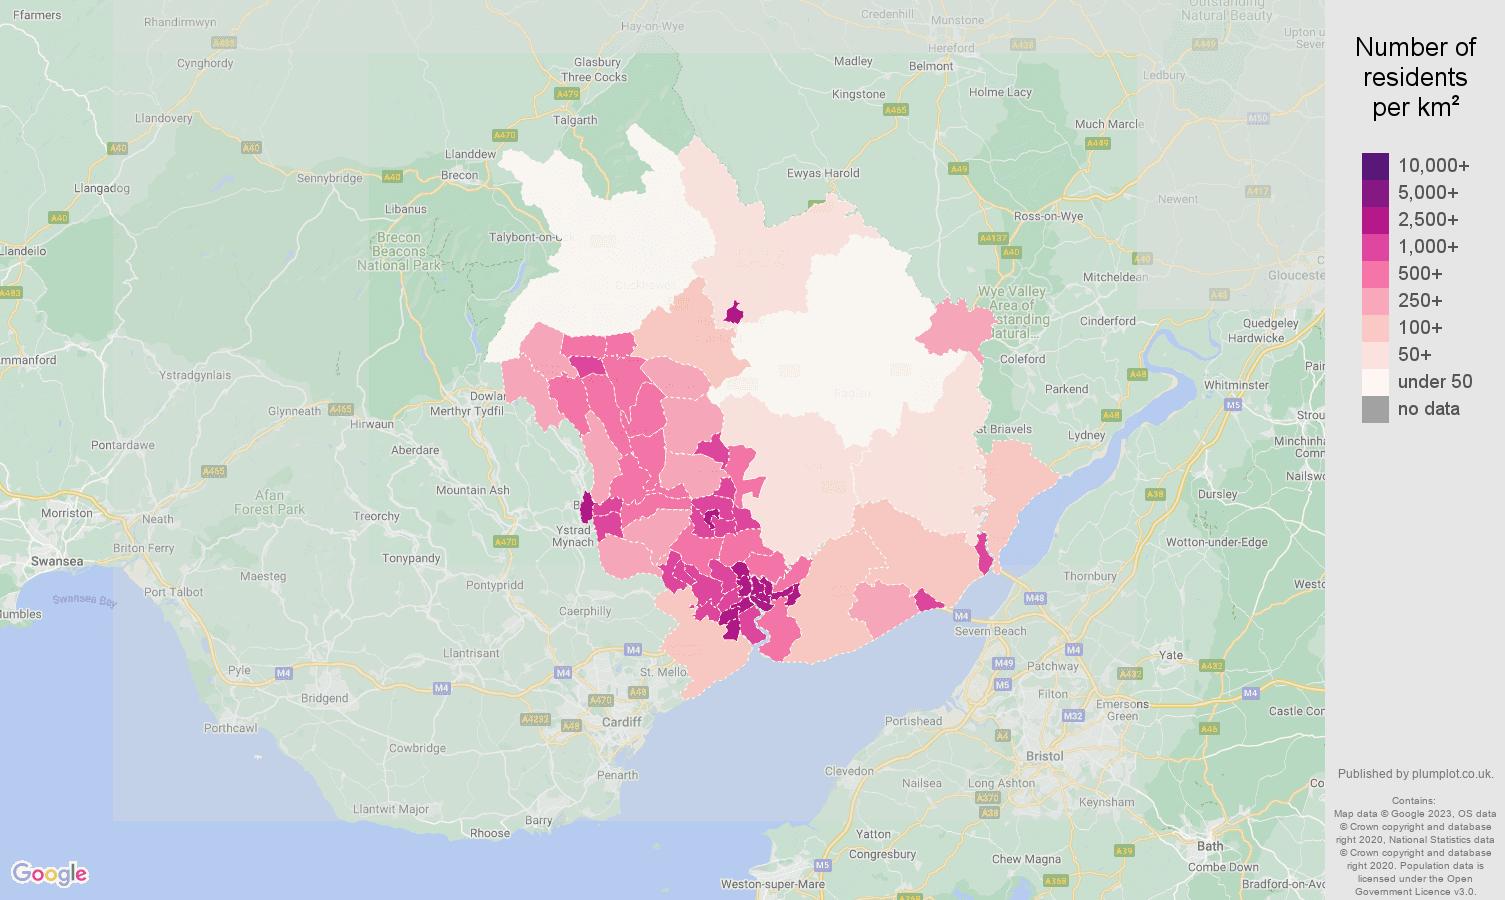 Newport population density map